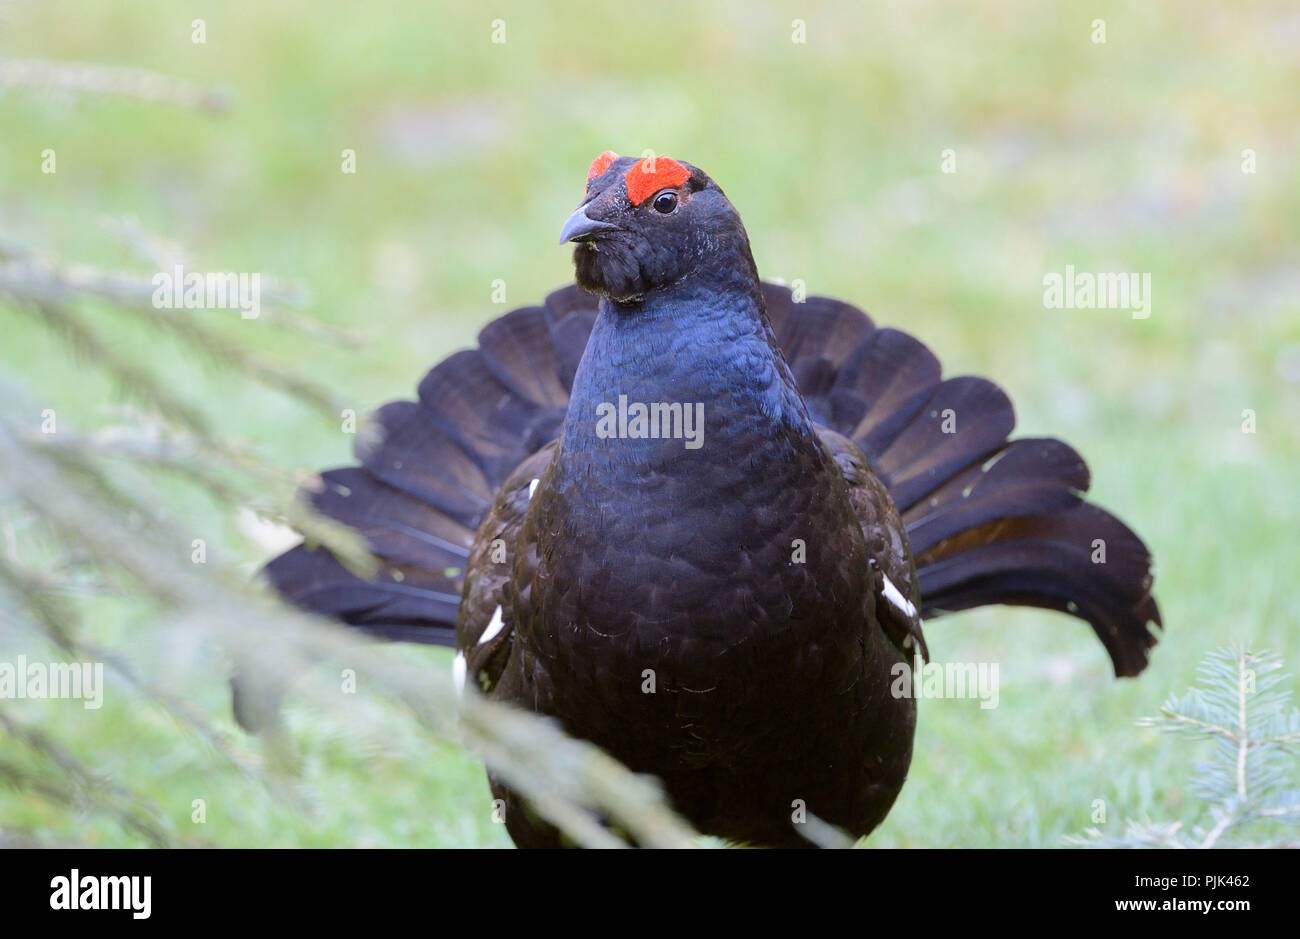 Blackgame, black grouse - Stock Image